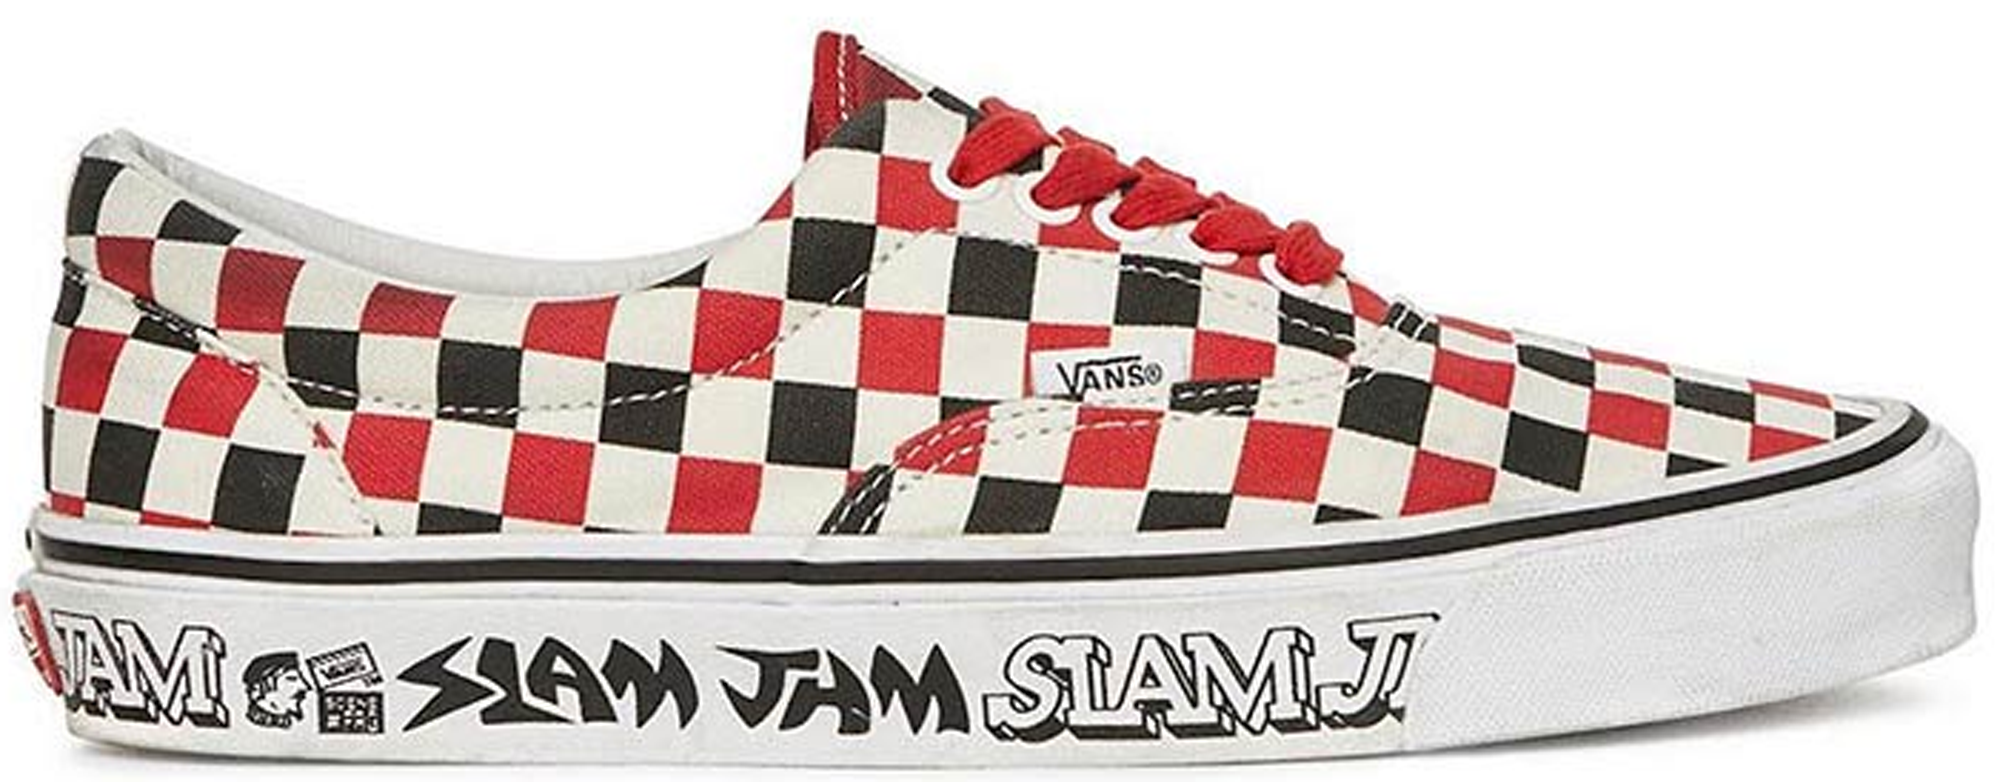 Vans Era Slam Jam